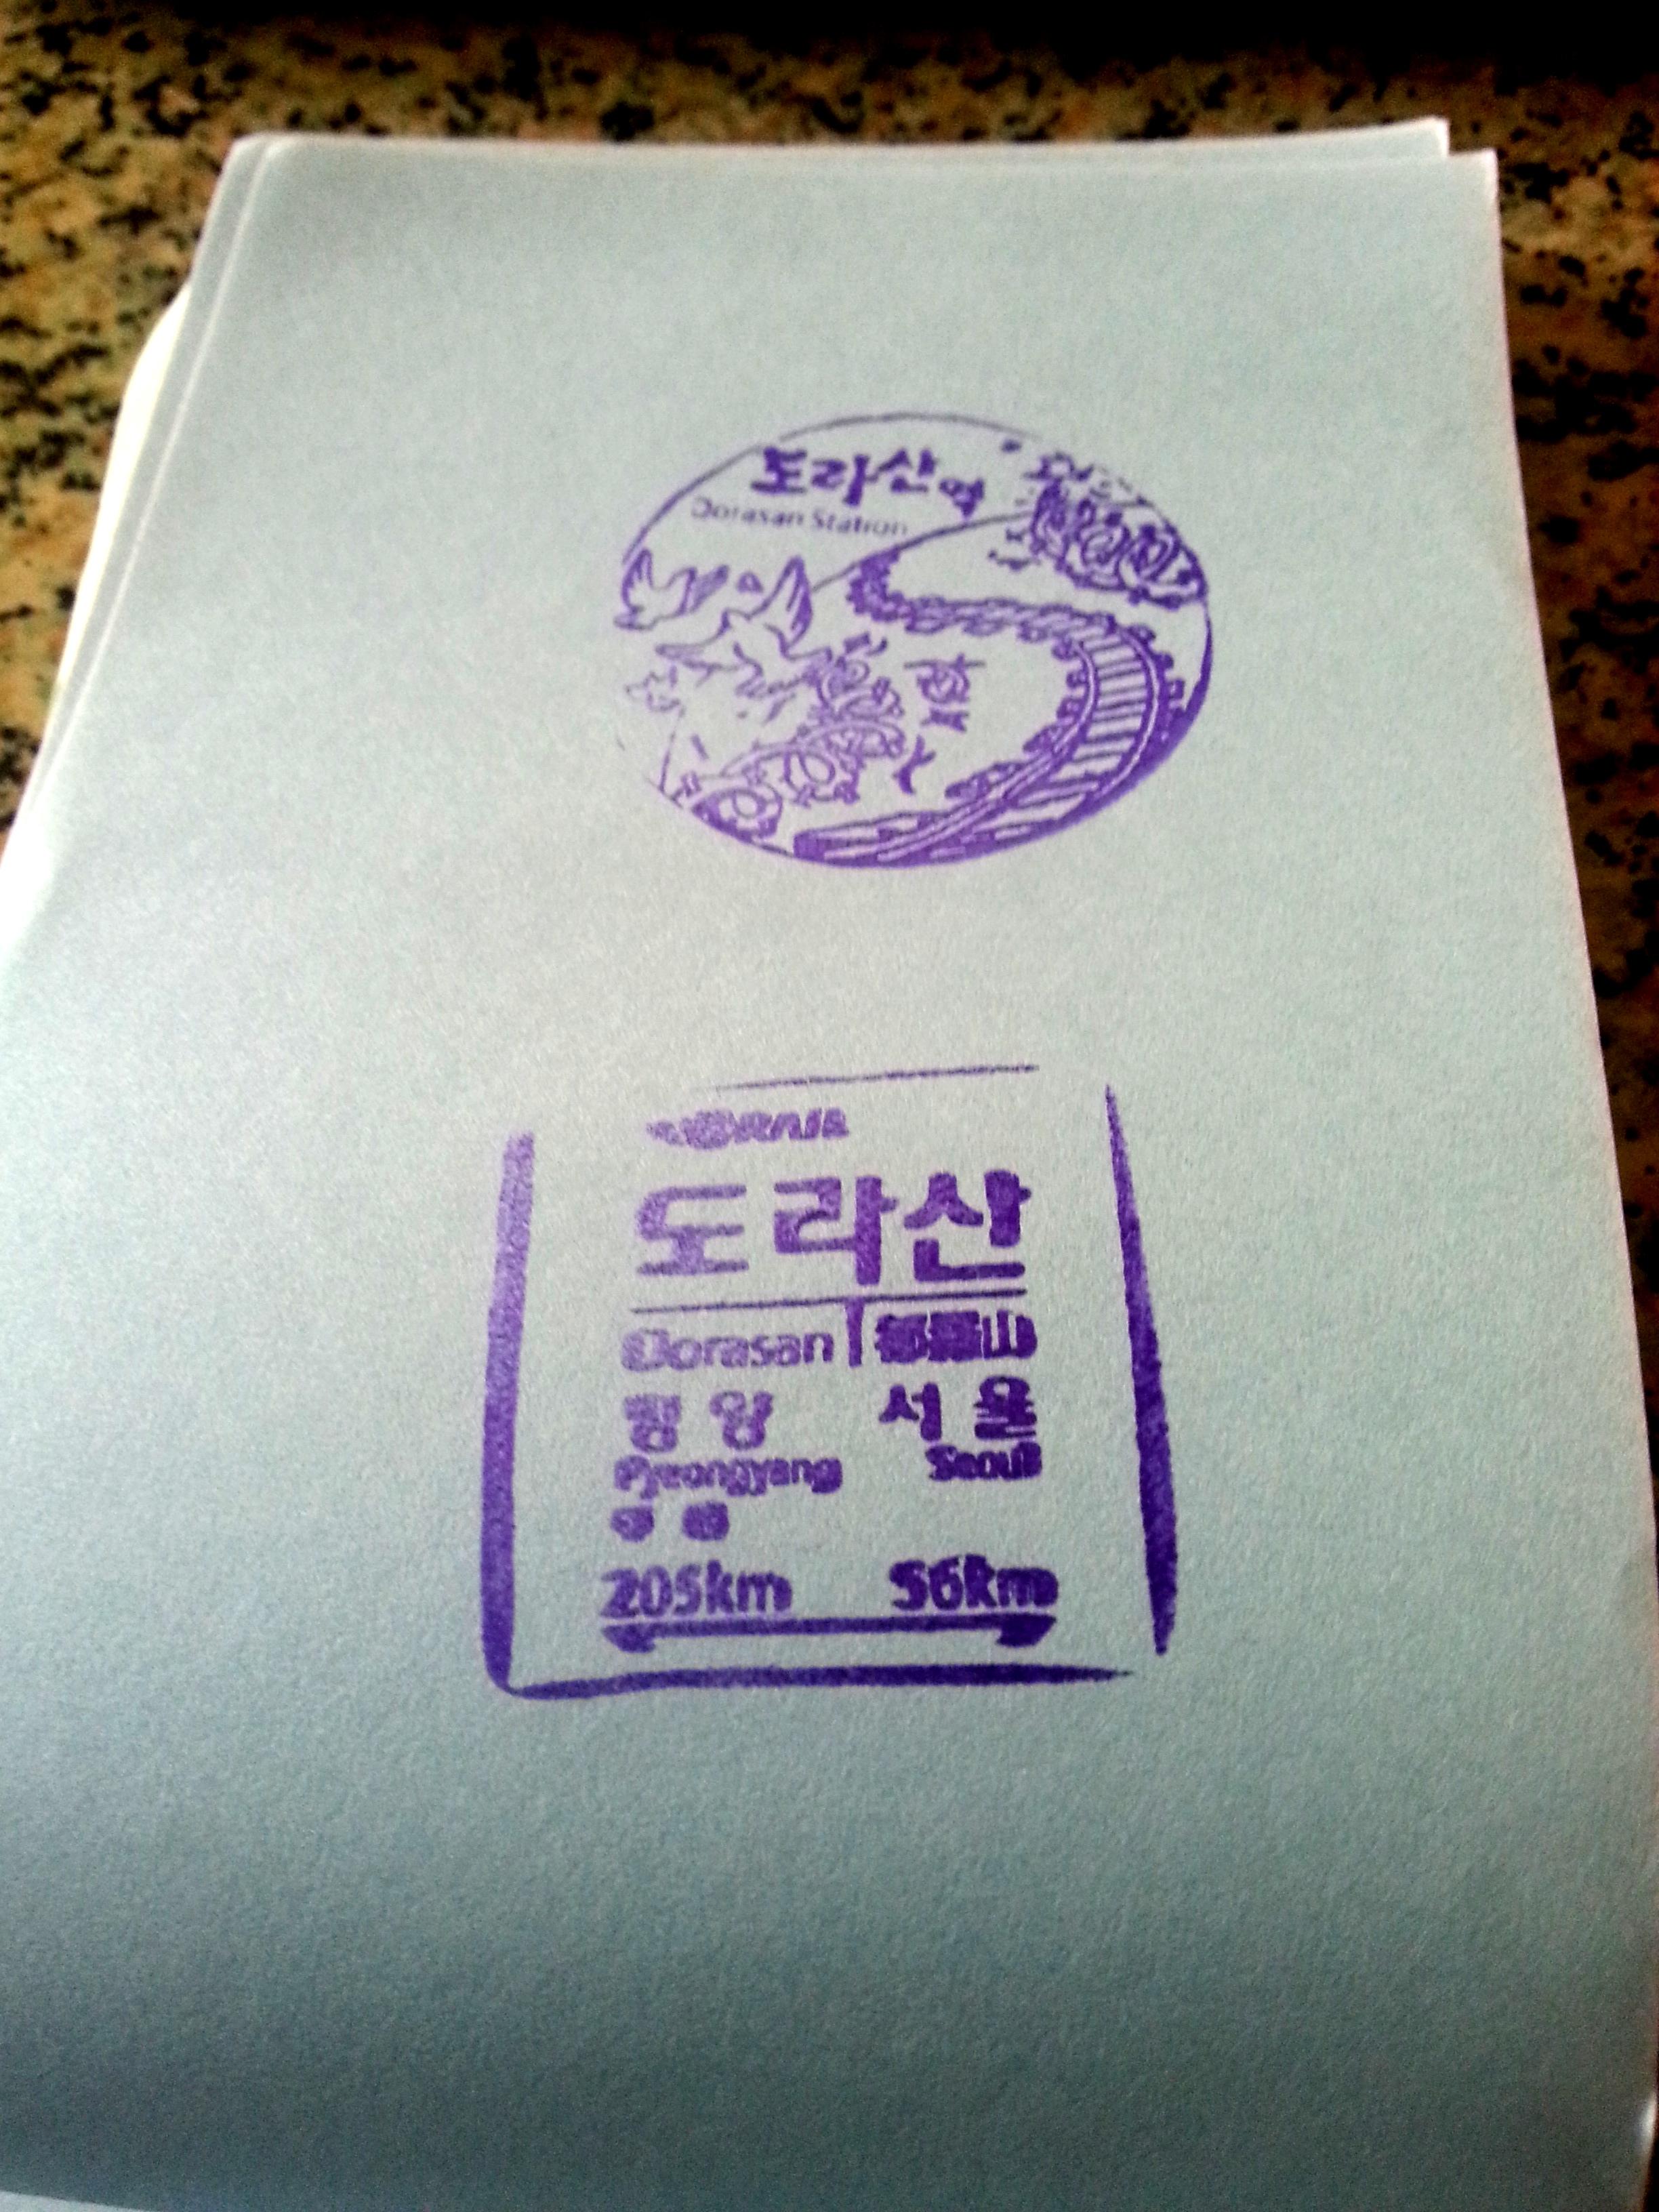 North Korean commemoration stamp